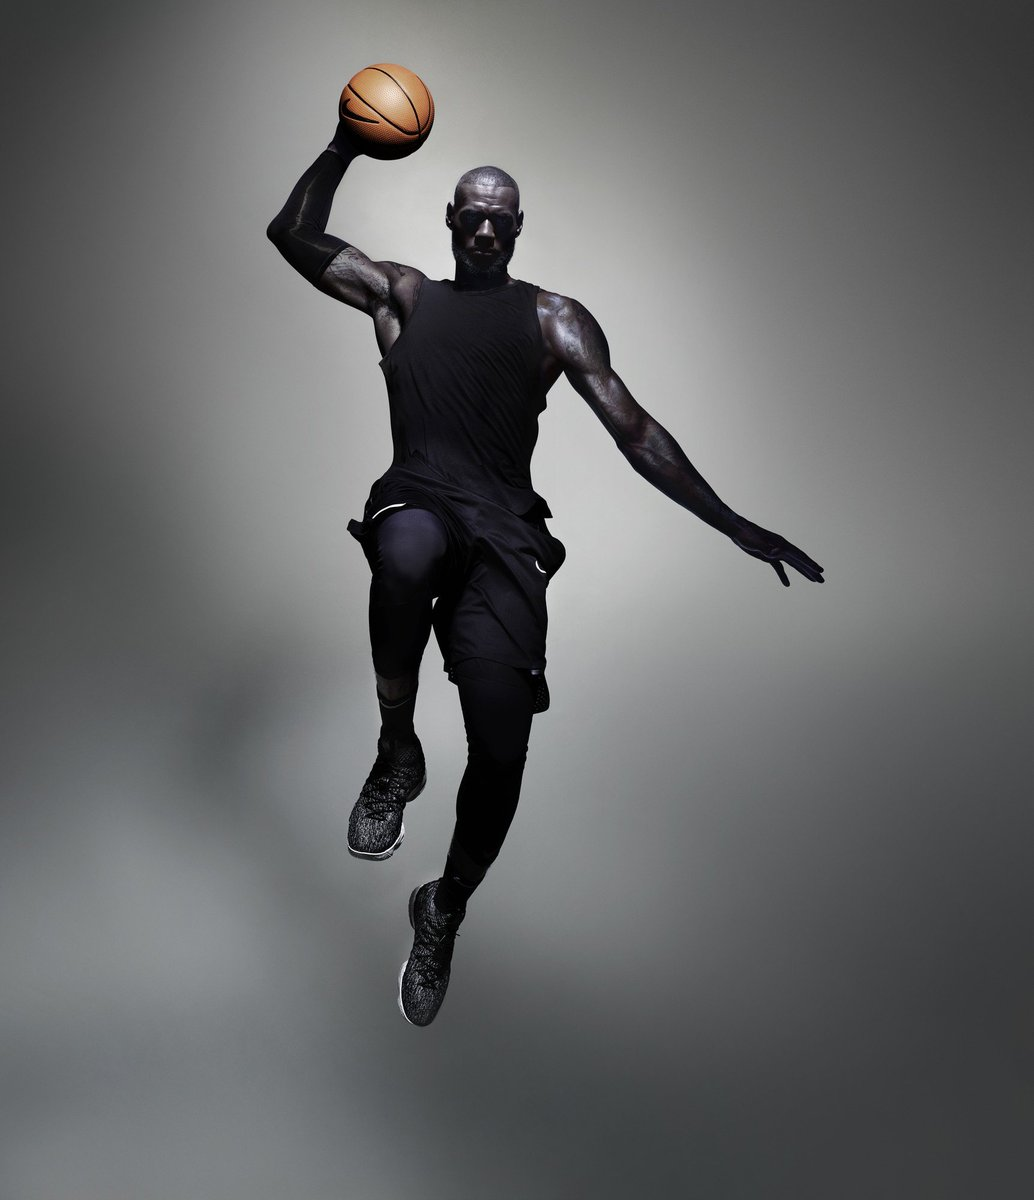 54ca97dc4 Nike Basketball on Twitter